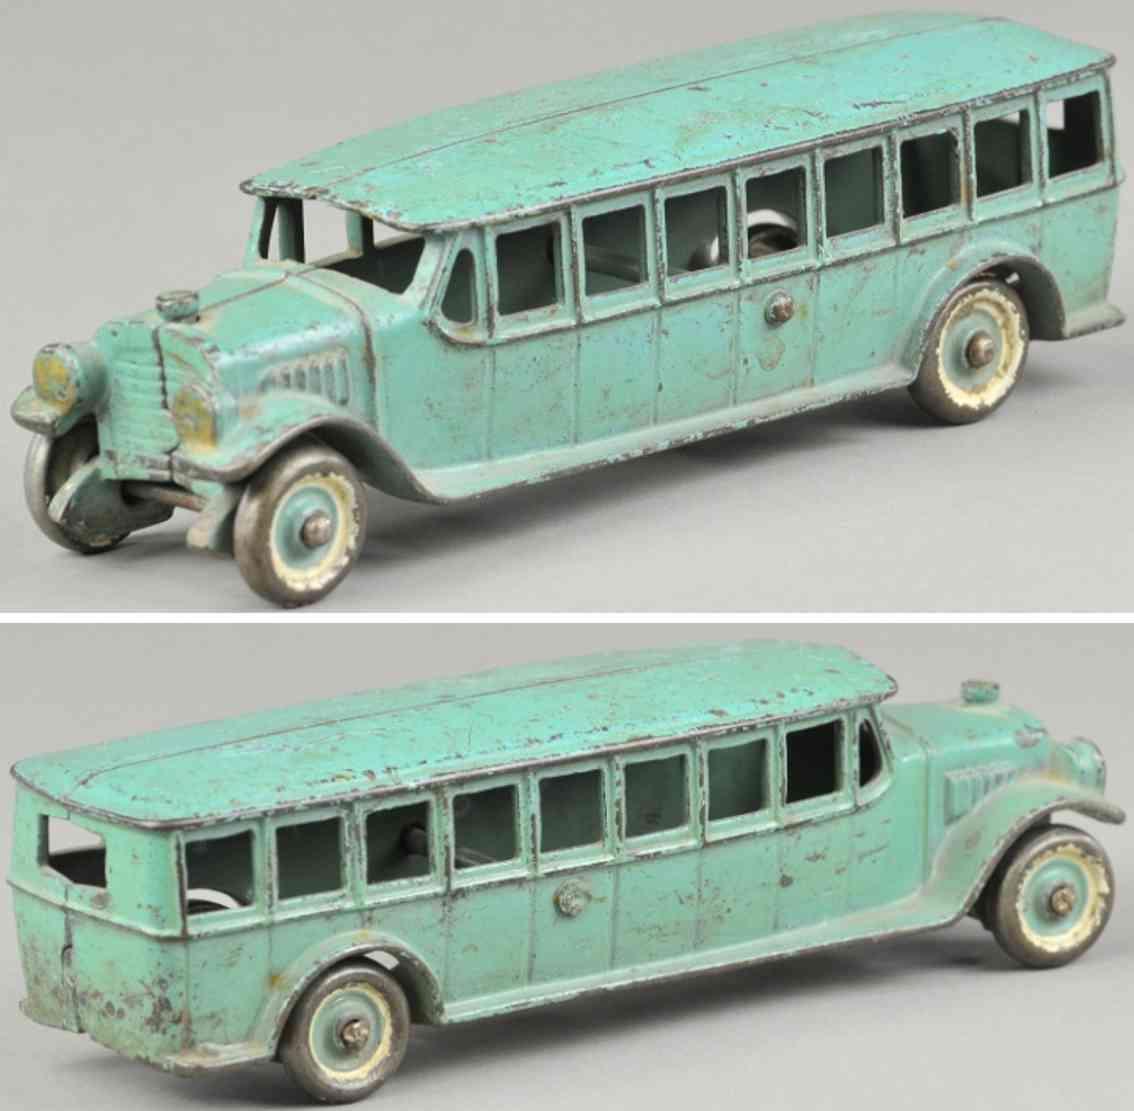 kenton hardware co cast iron toy coach bus blue